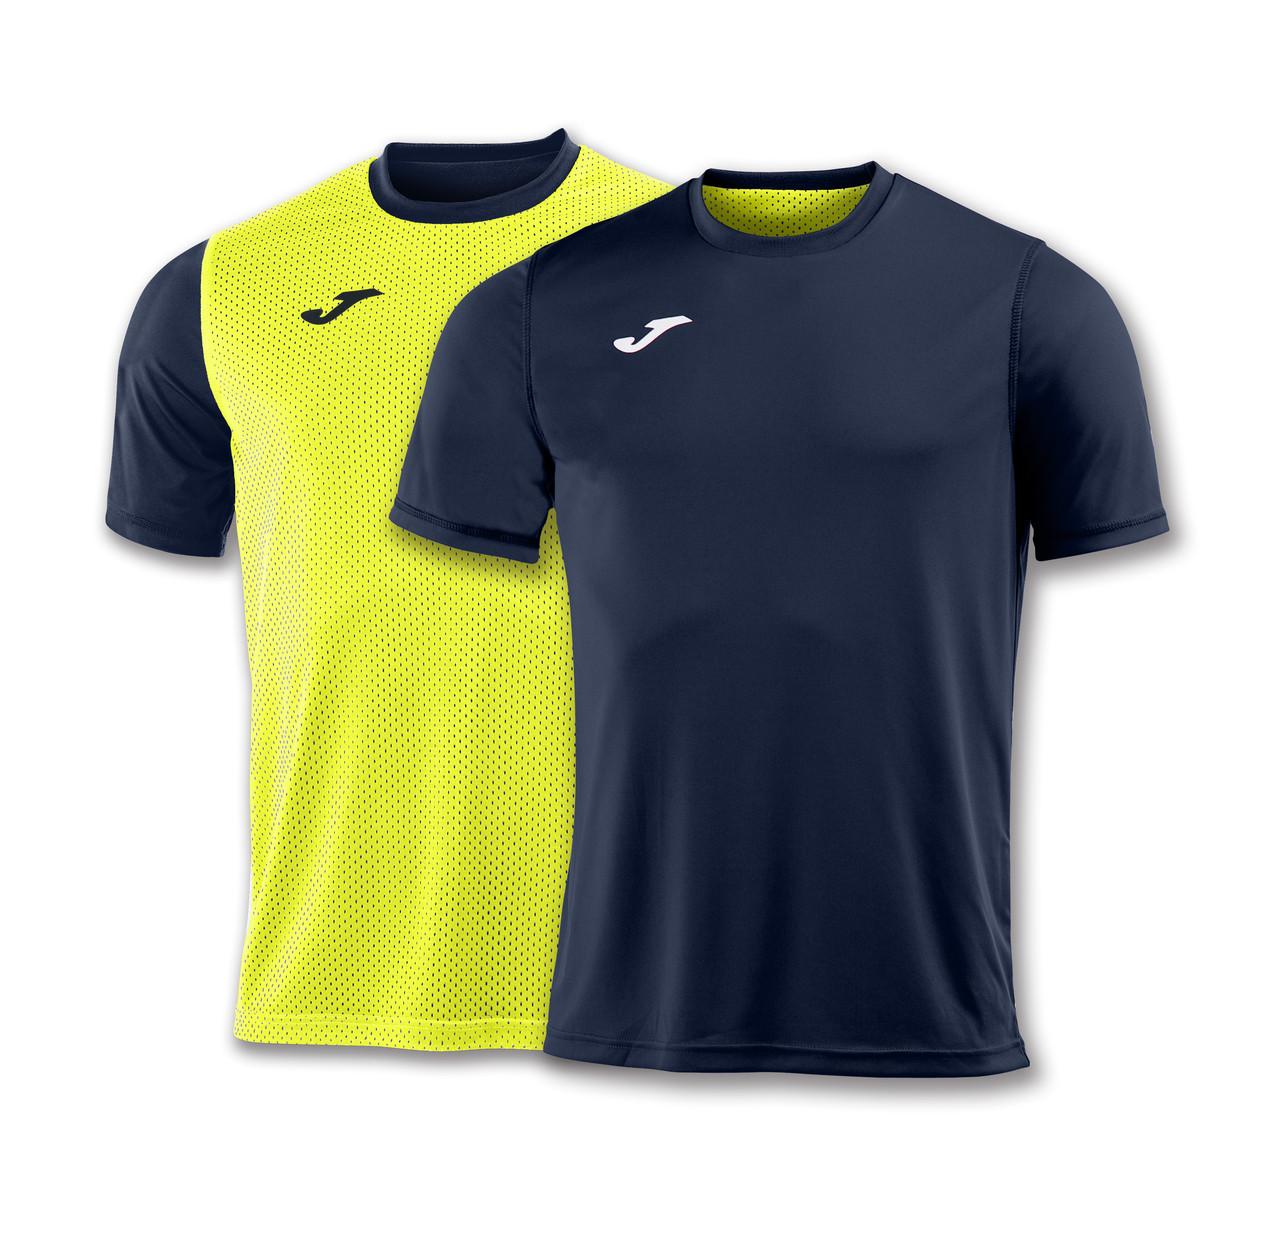 719681ac98 Joma Combi Reversible T-shirt - Galaxyfootball